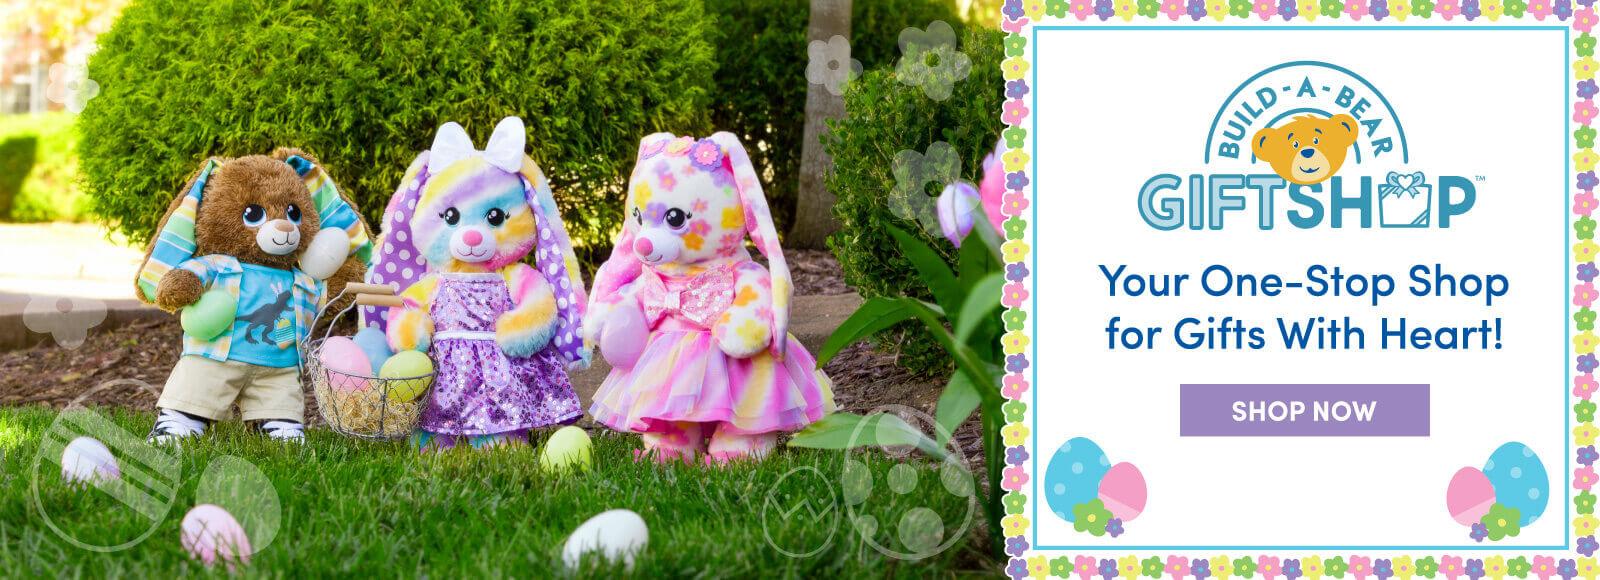 Shop Build-A-Bear Workshop for Easter gifts